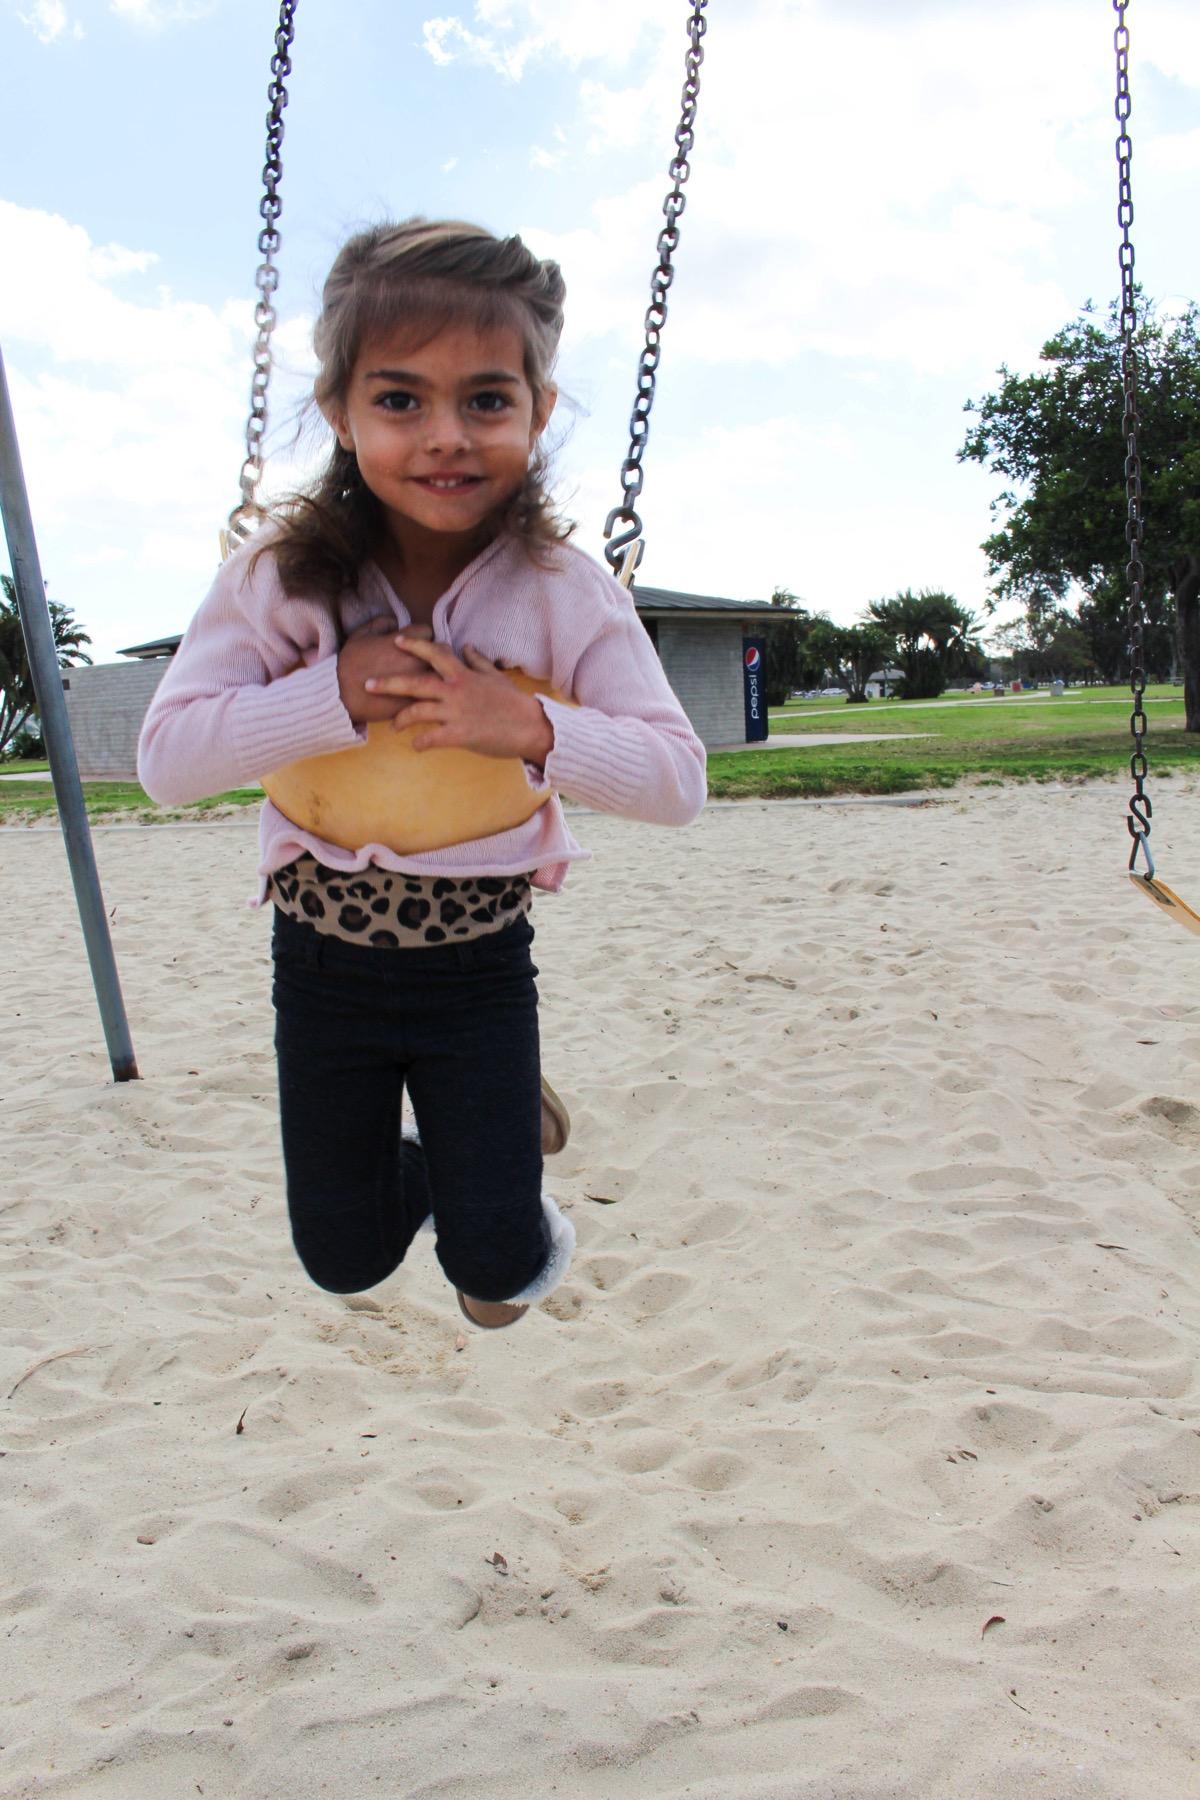 Livi swinging